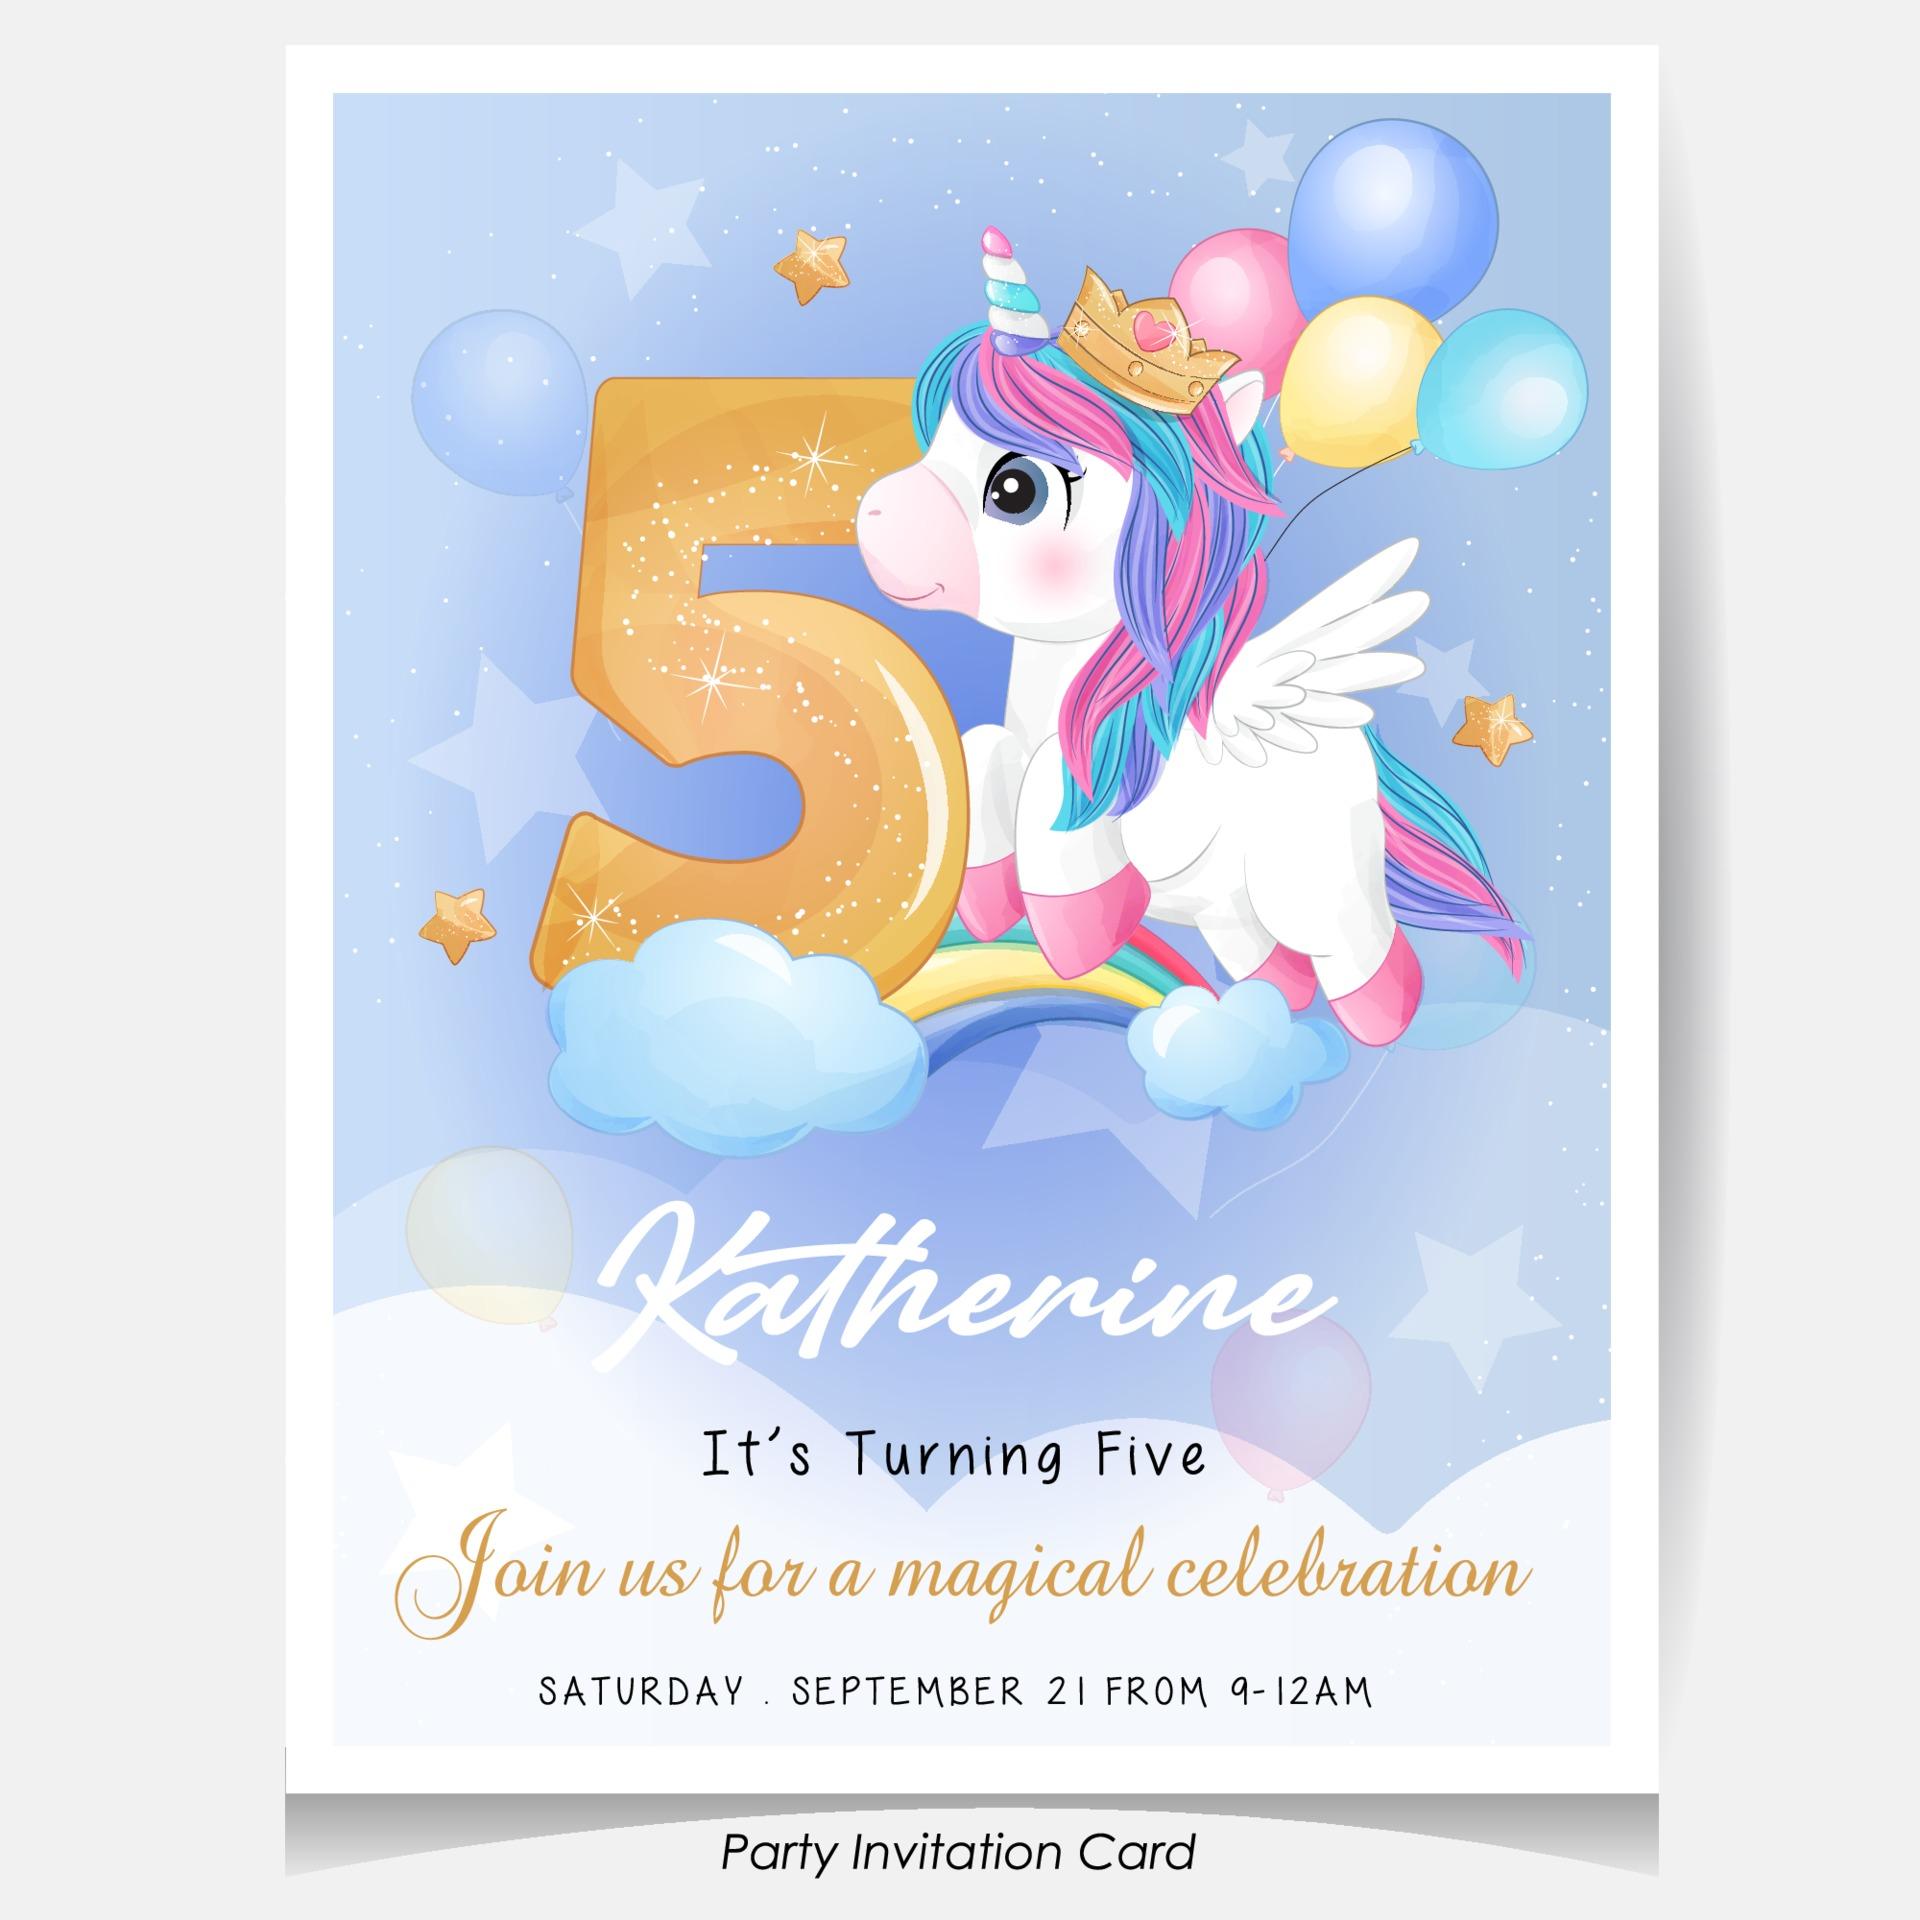 https www vecteezy com vector art 2064091 cute doodle unicorn birthday party invitation card illustration